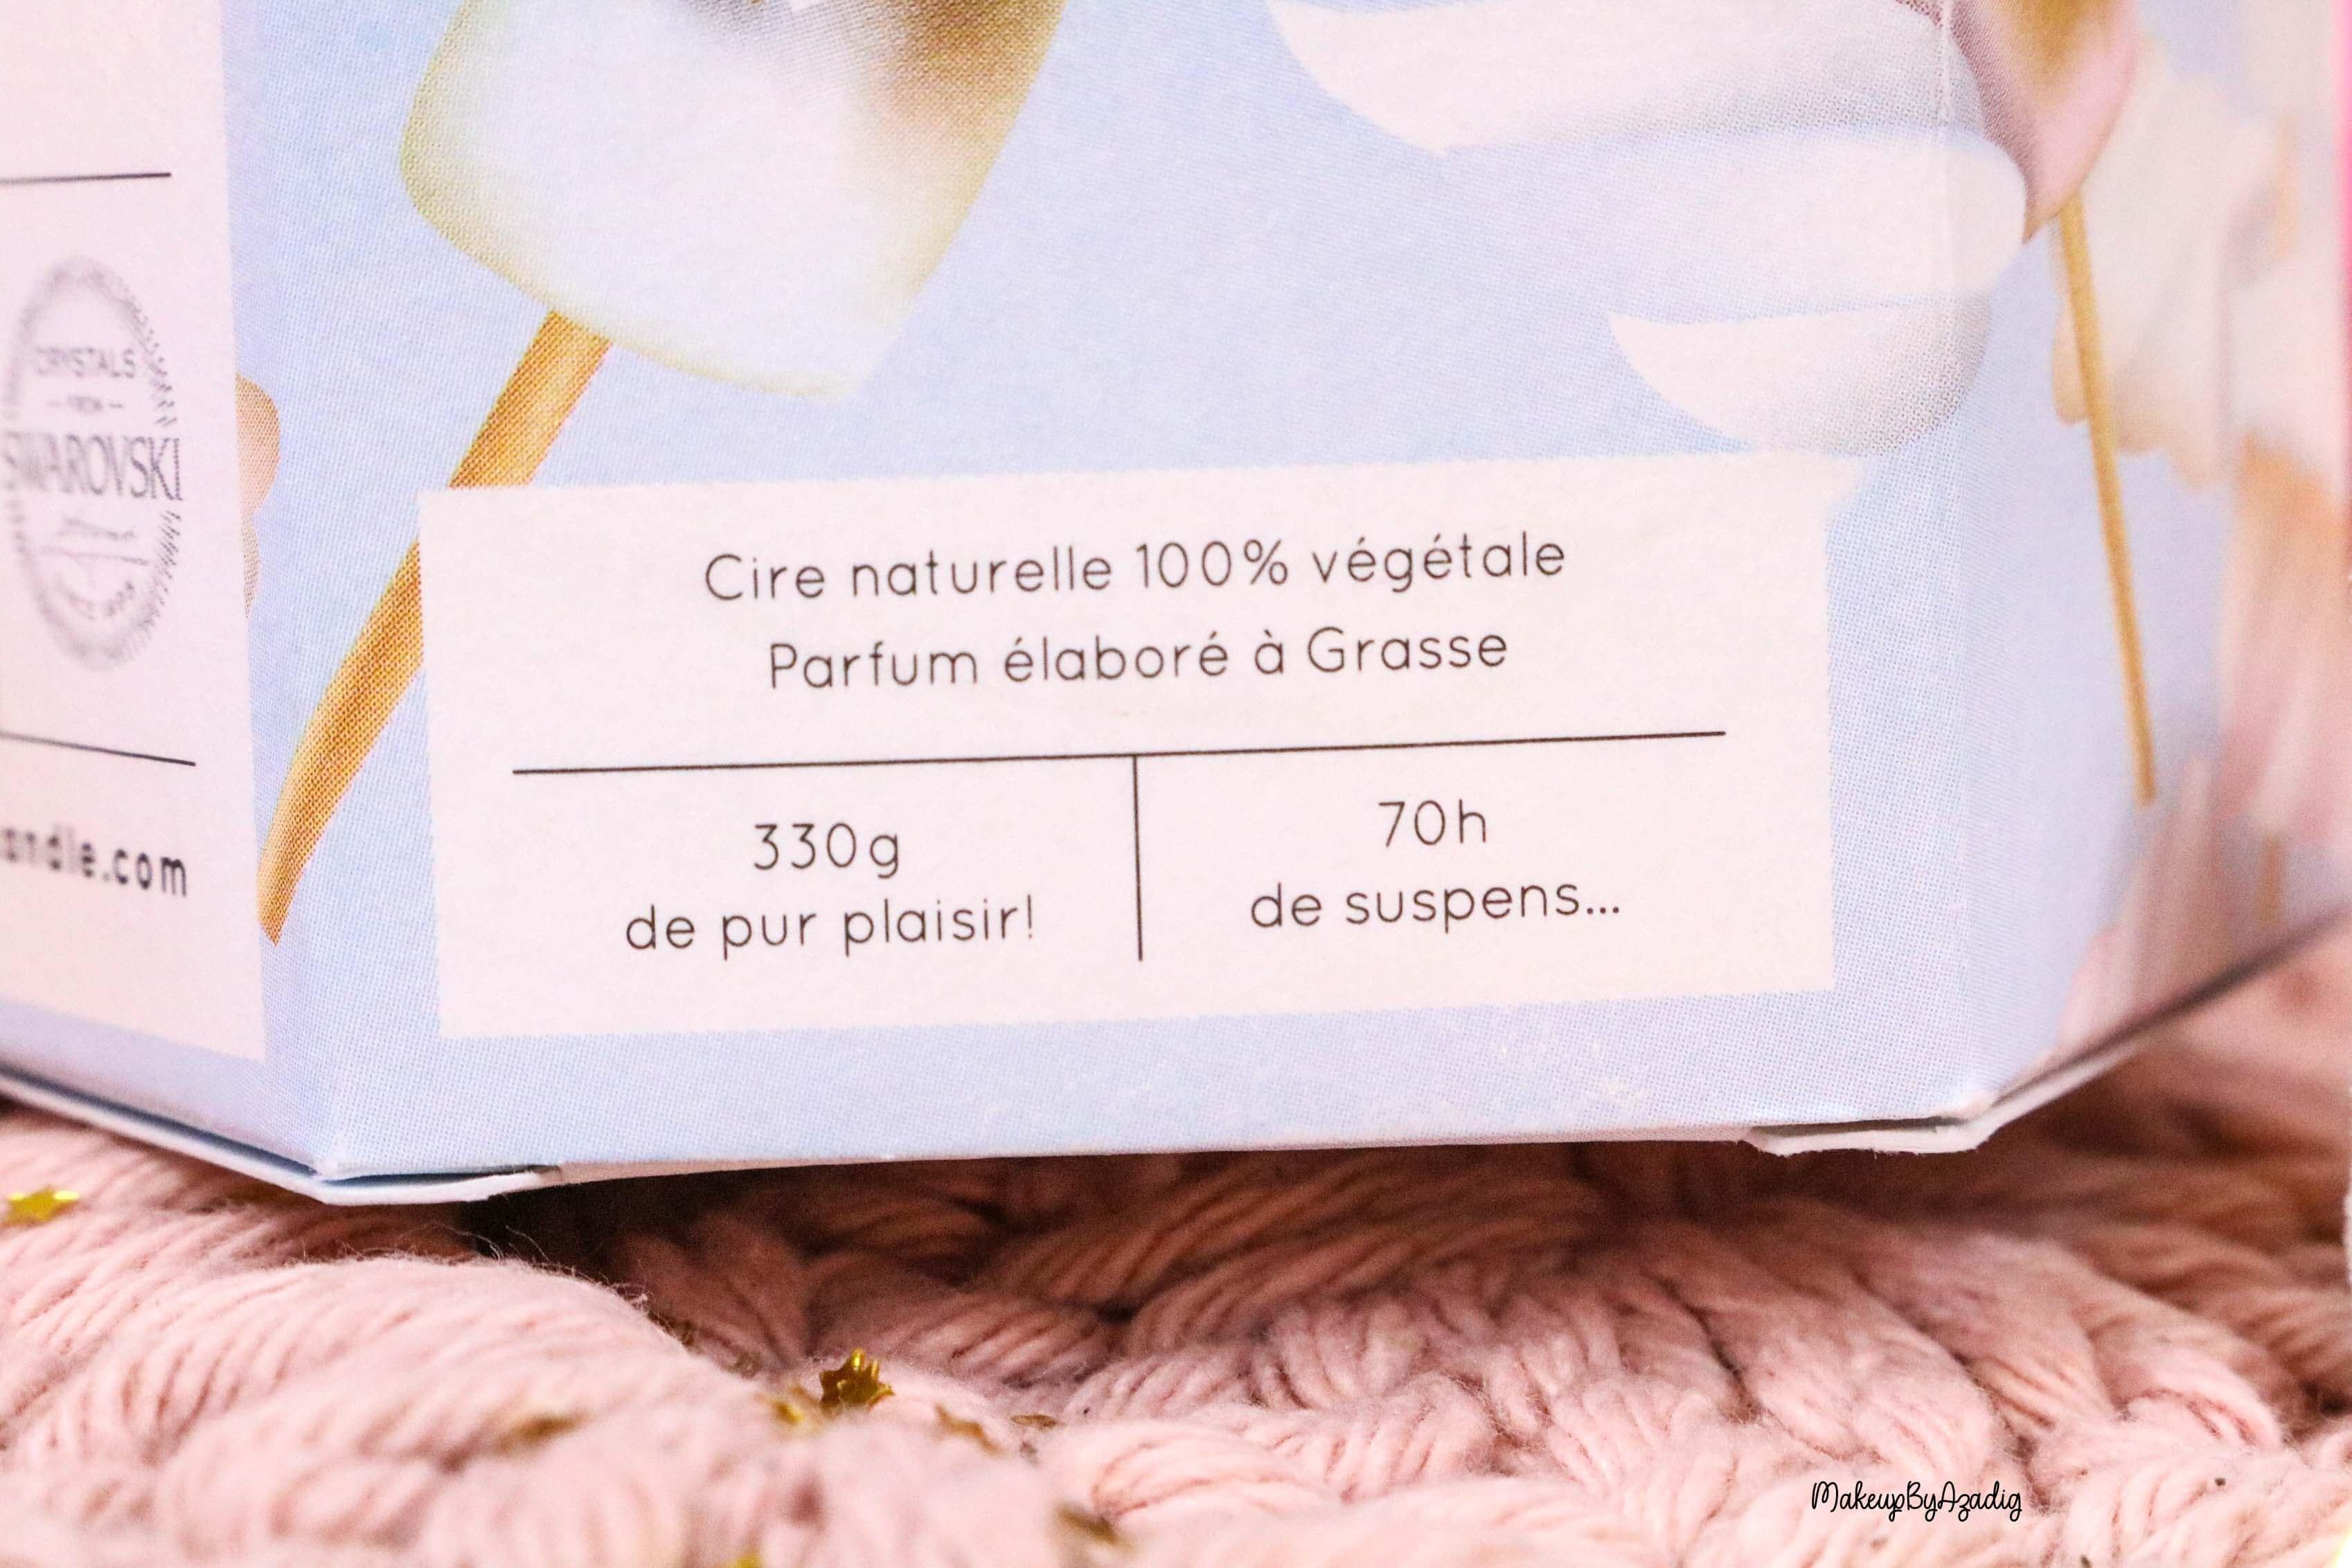 my-jolie-candle-bougie-bijou-swarovski-argent-cadeau-maman-mamie-femme-makeupbyazadig-collector-chamallow-avis-prix-cire-naturelle